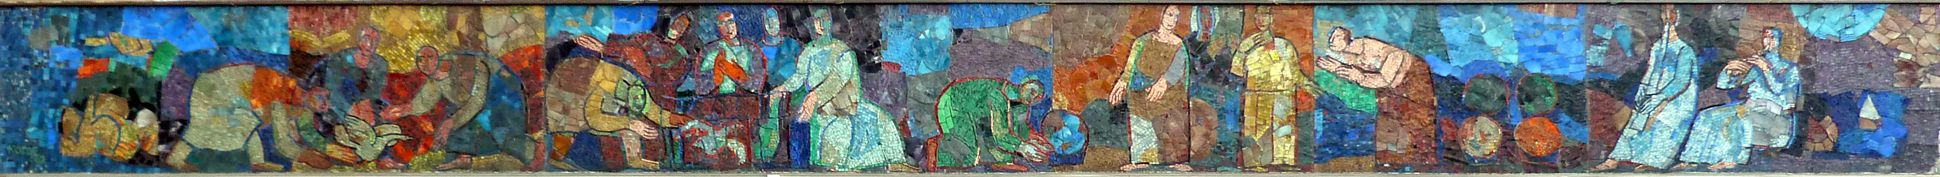 Mosaic on the Main Market (Hauptmarkt) in Nuremberg Mosaic strip of the north side